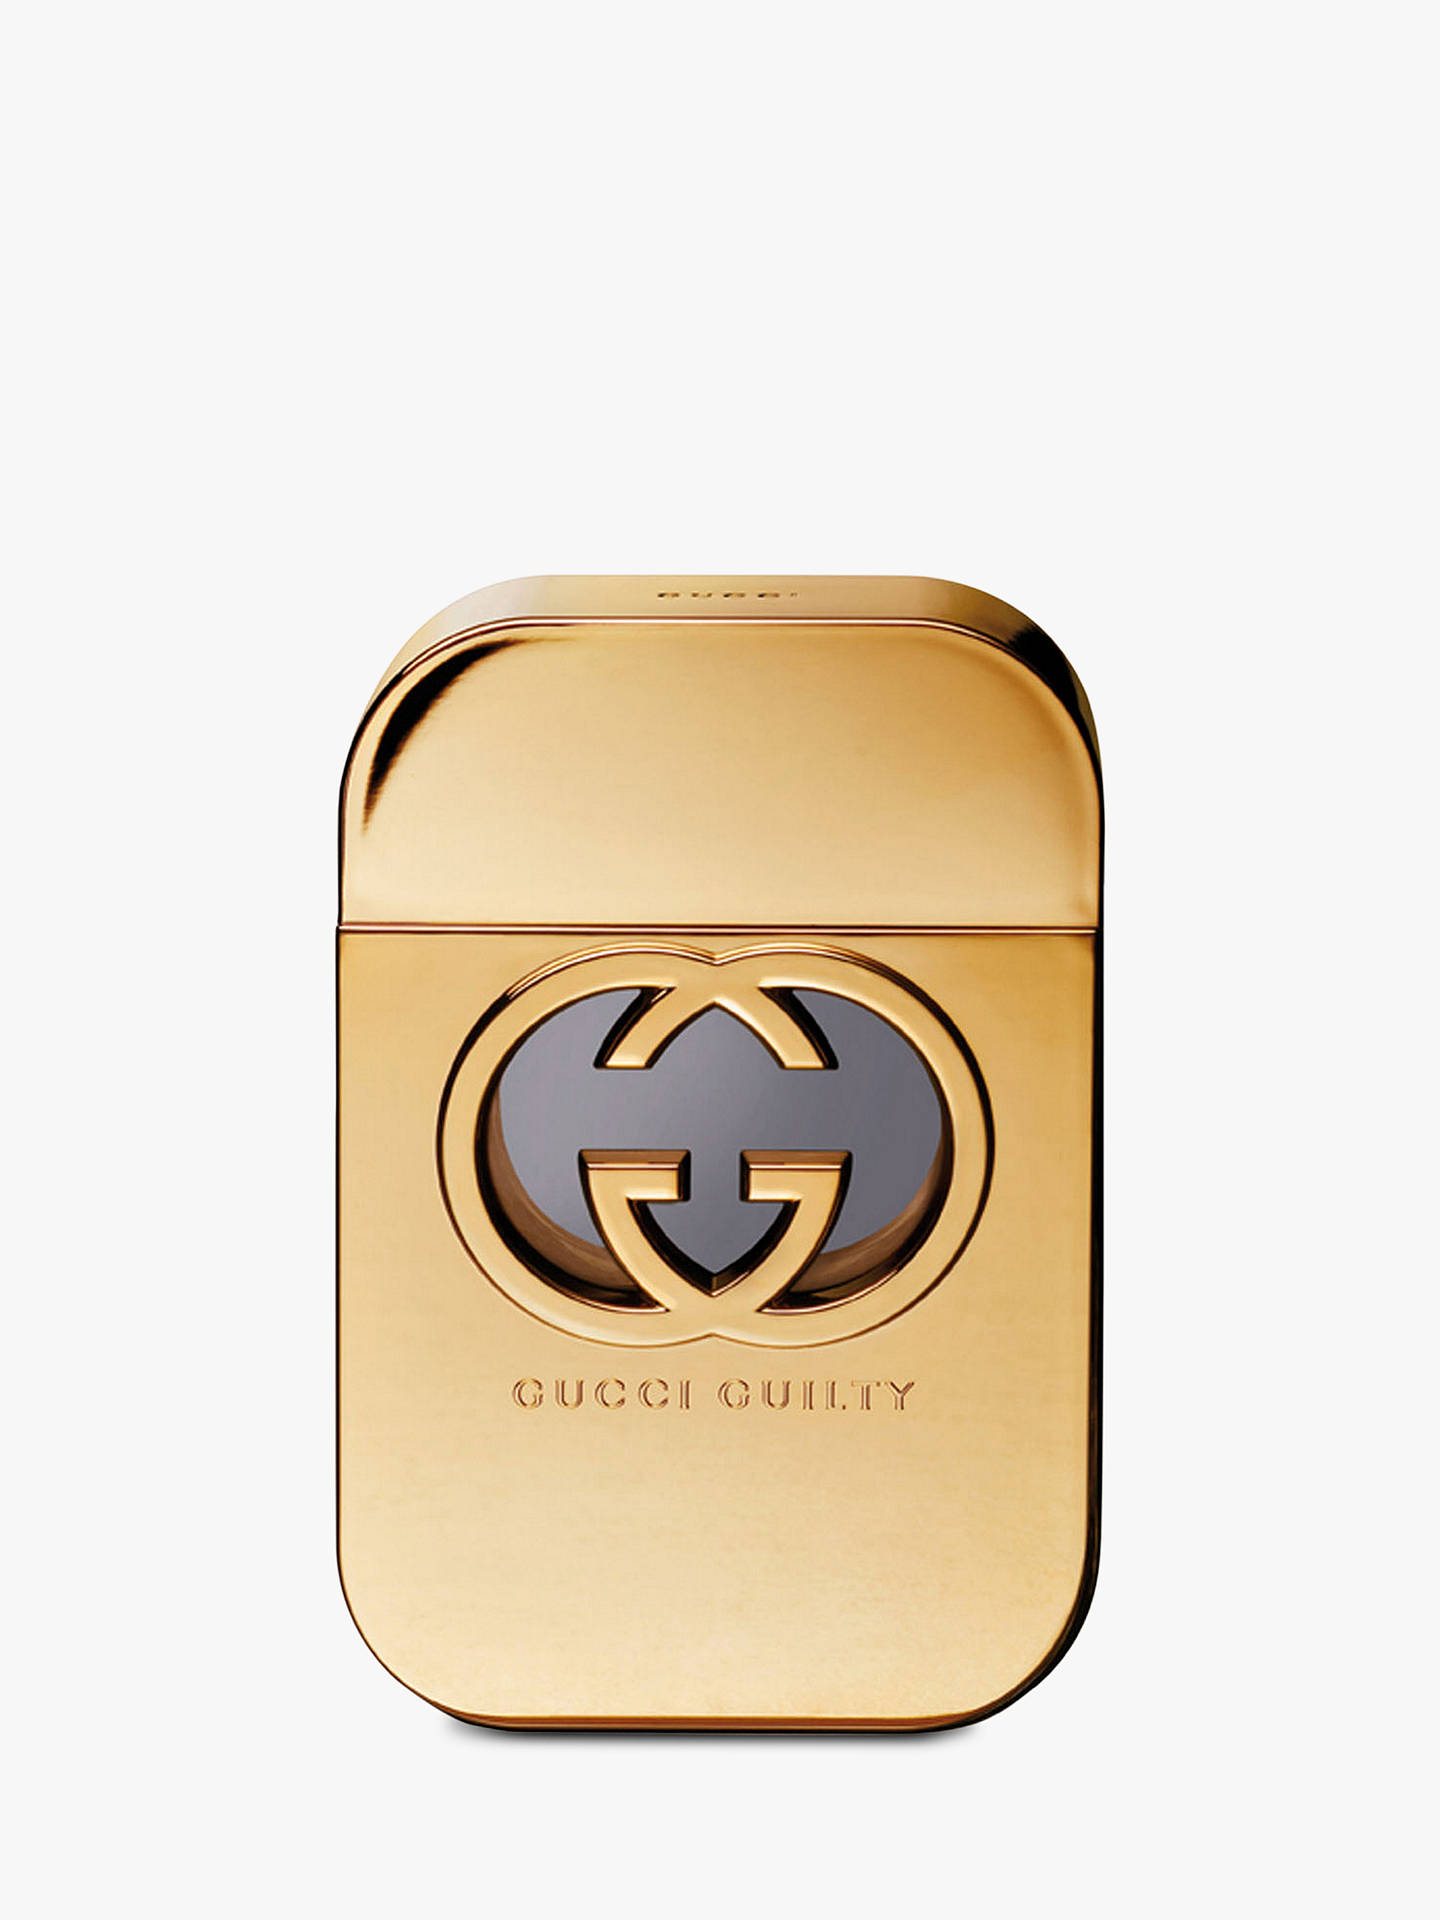 9c0cdc8a2 Buy Gucci Guillty Intense Eau de Parfum for Her, 75ml Online at  johnlewis.com